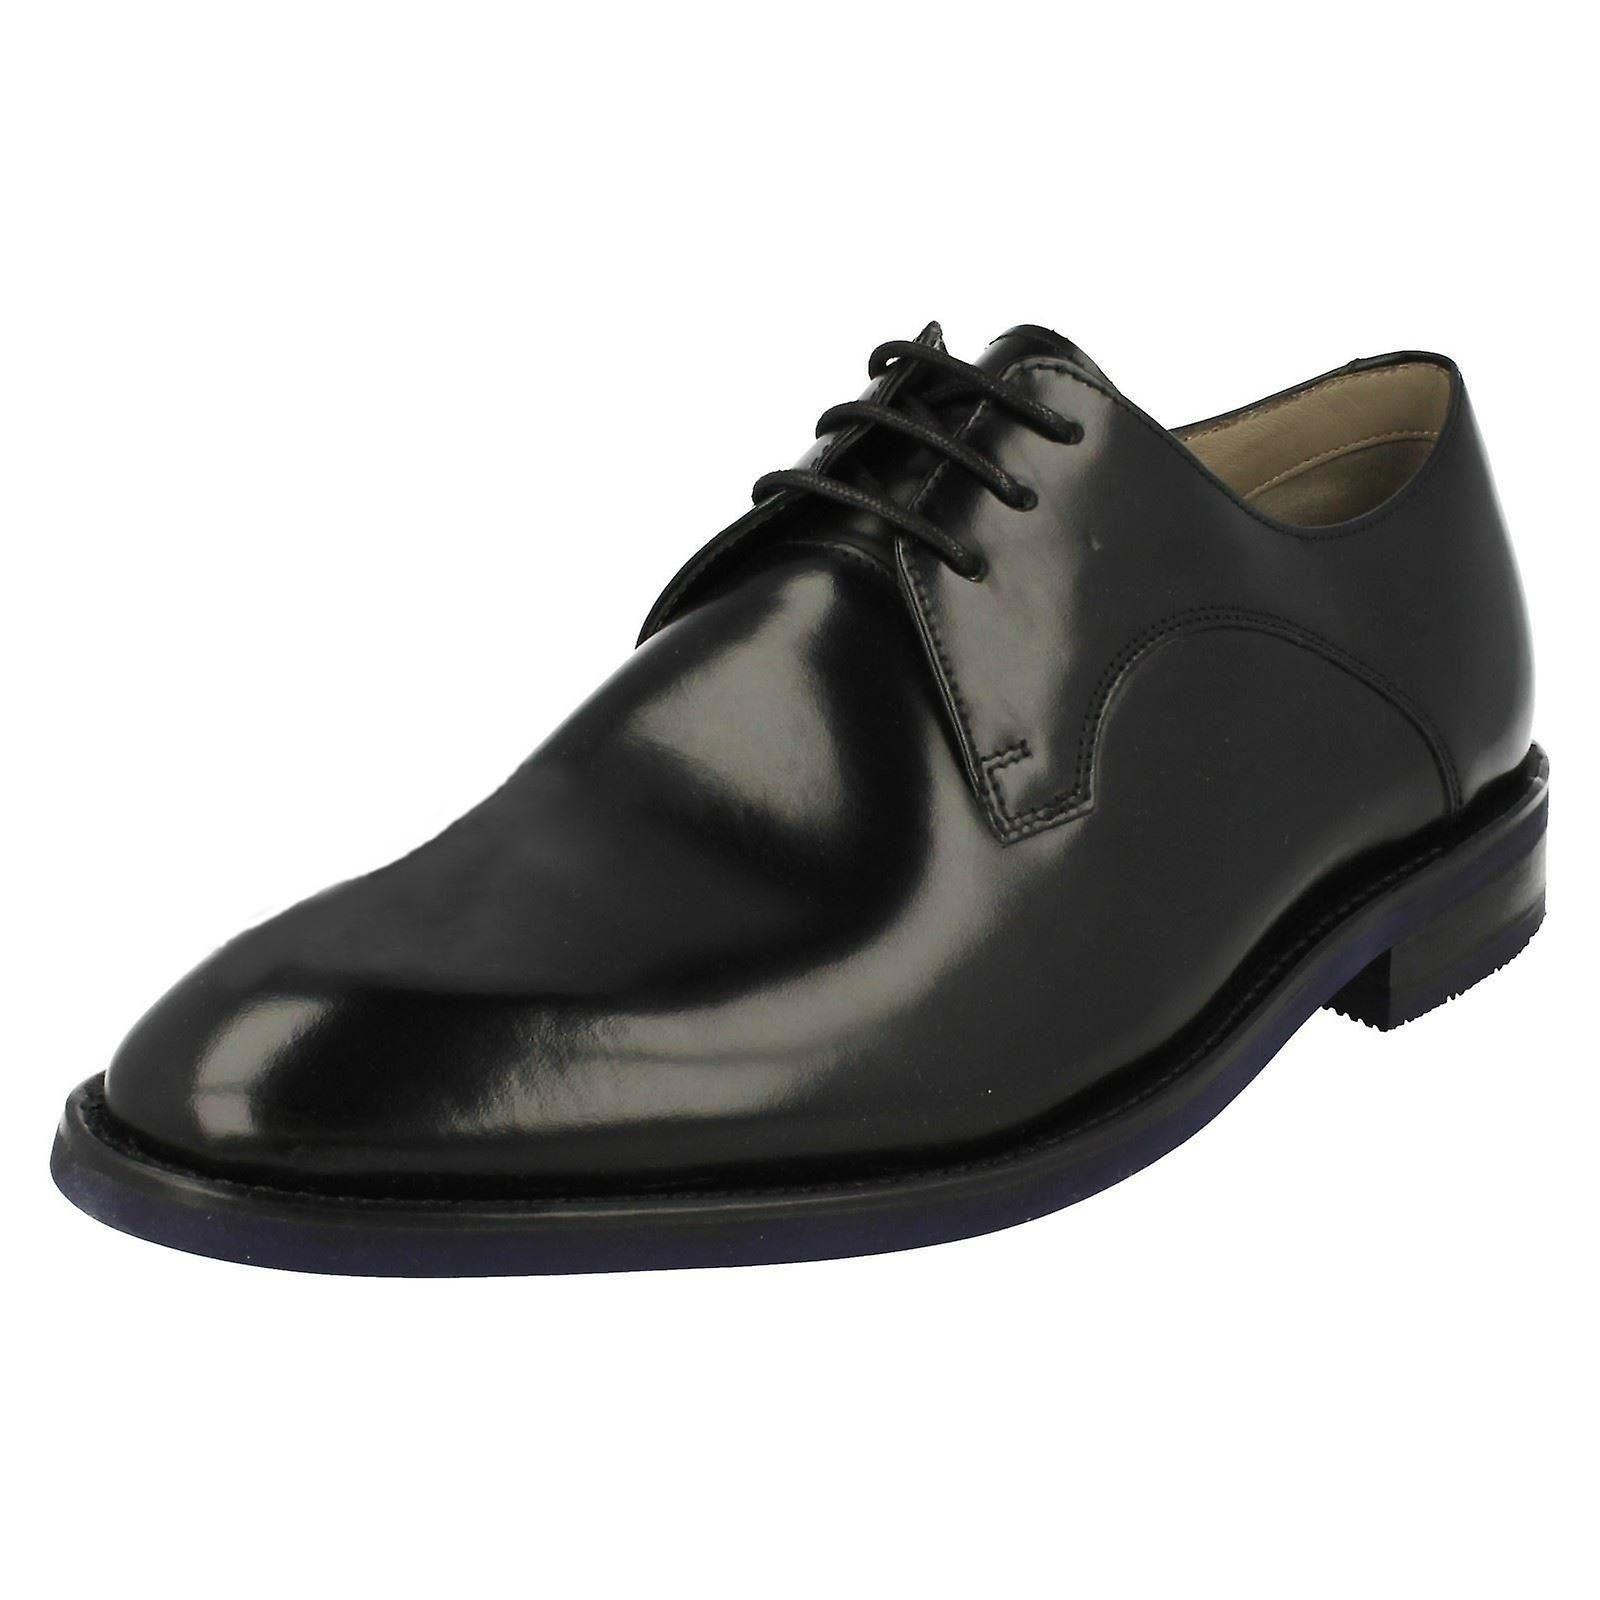 Mens Clarks formelle Lace Up chaussures Swinley dentelle